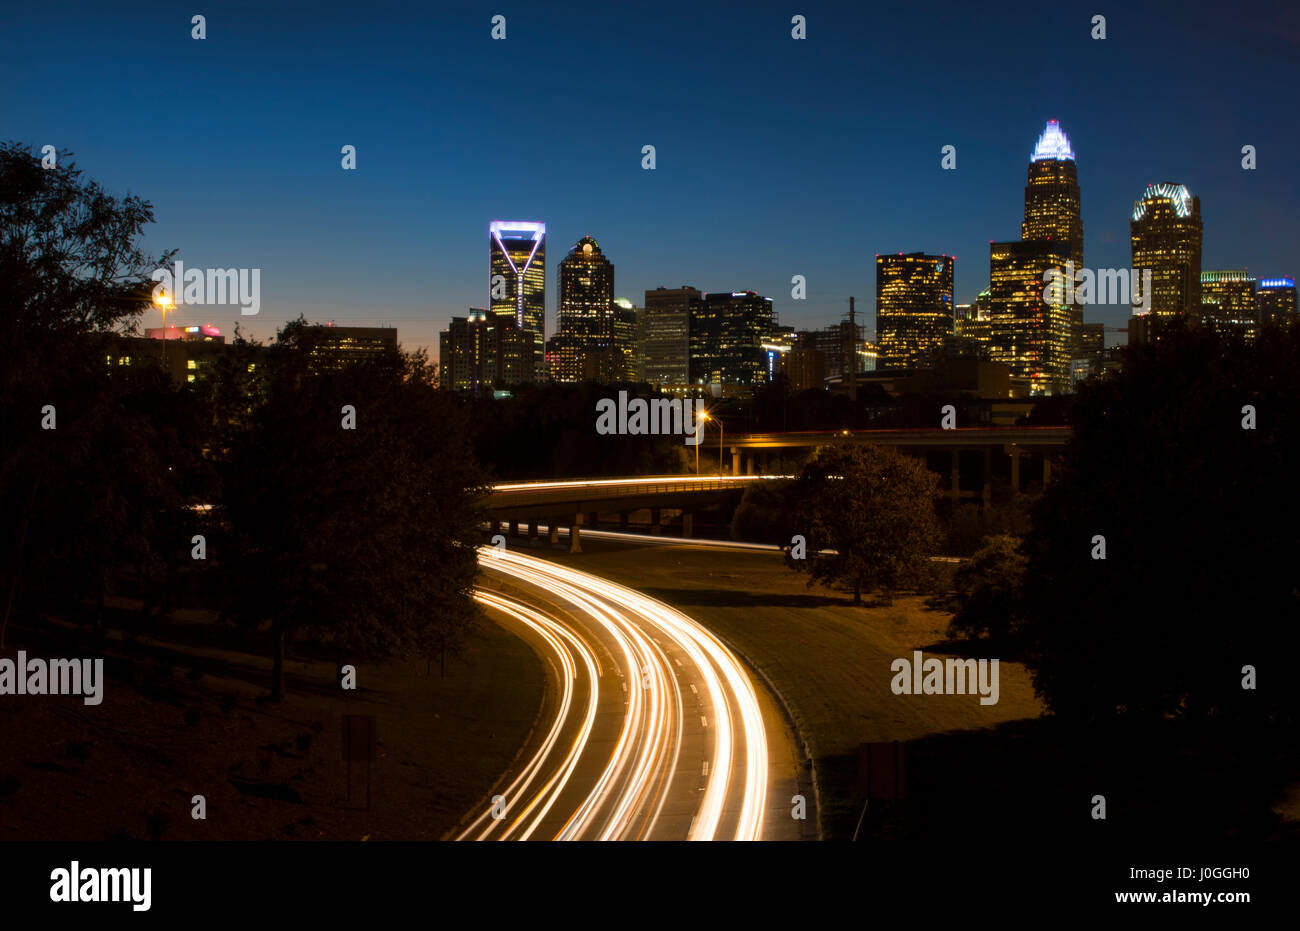 Charlotte North Carolina skyline at night with traffic blurs and twilight - Stock Image